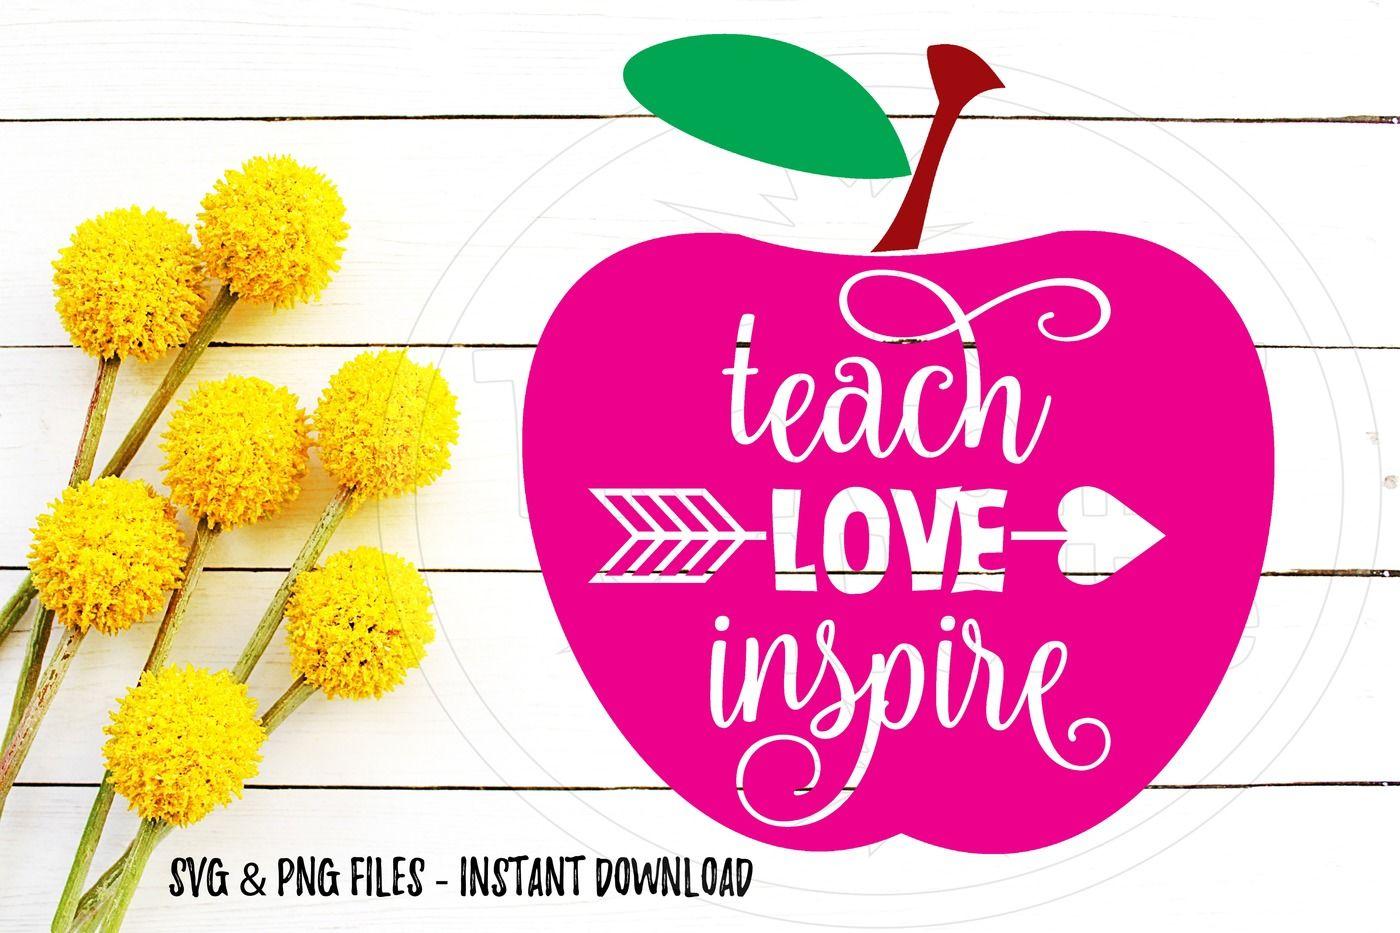 Teach Love Inspire Svg Print Cut Image Files Cameo Cricut By